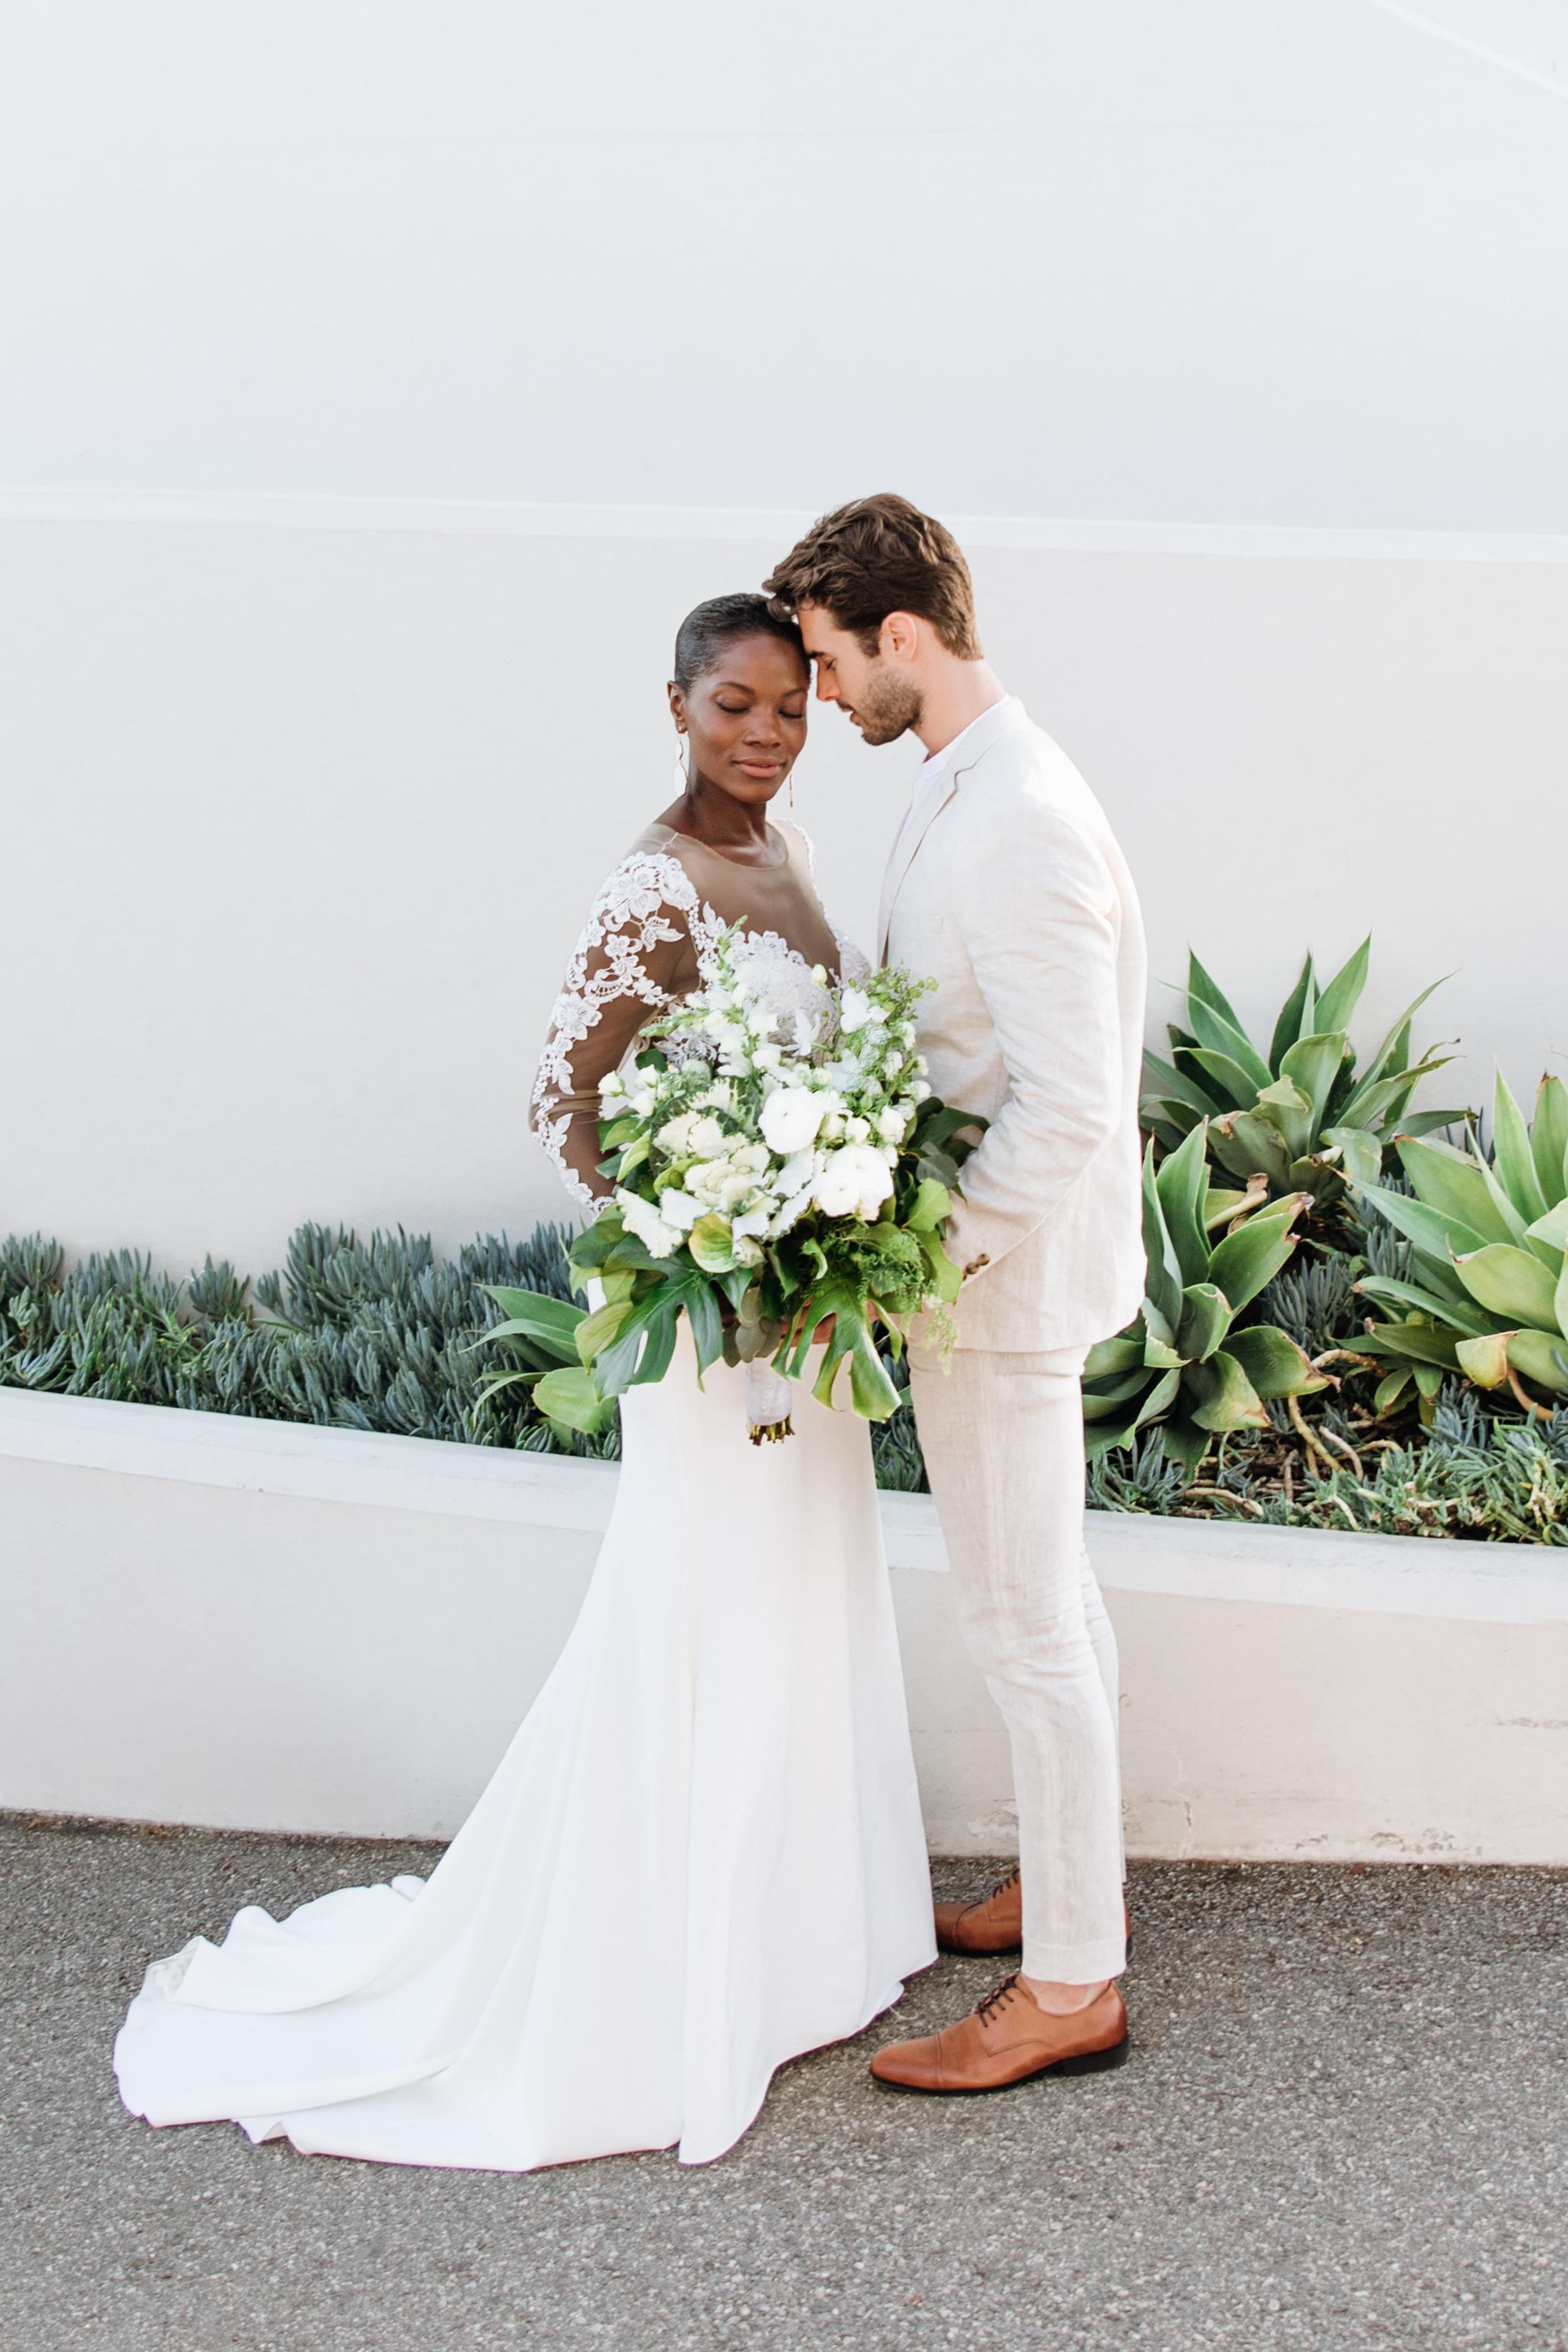 los-angeles-california-griffith-observatory-wedding-bridal-photography-michael-cozzens-45.jpg